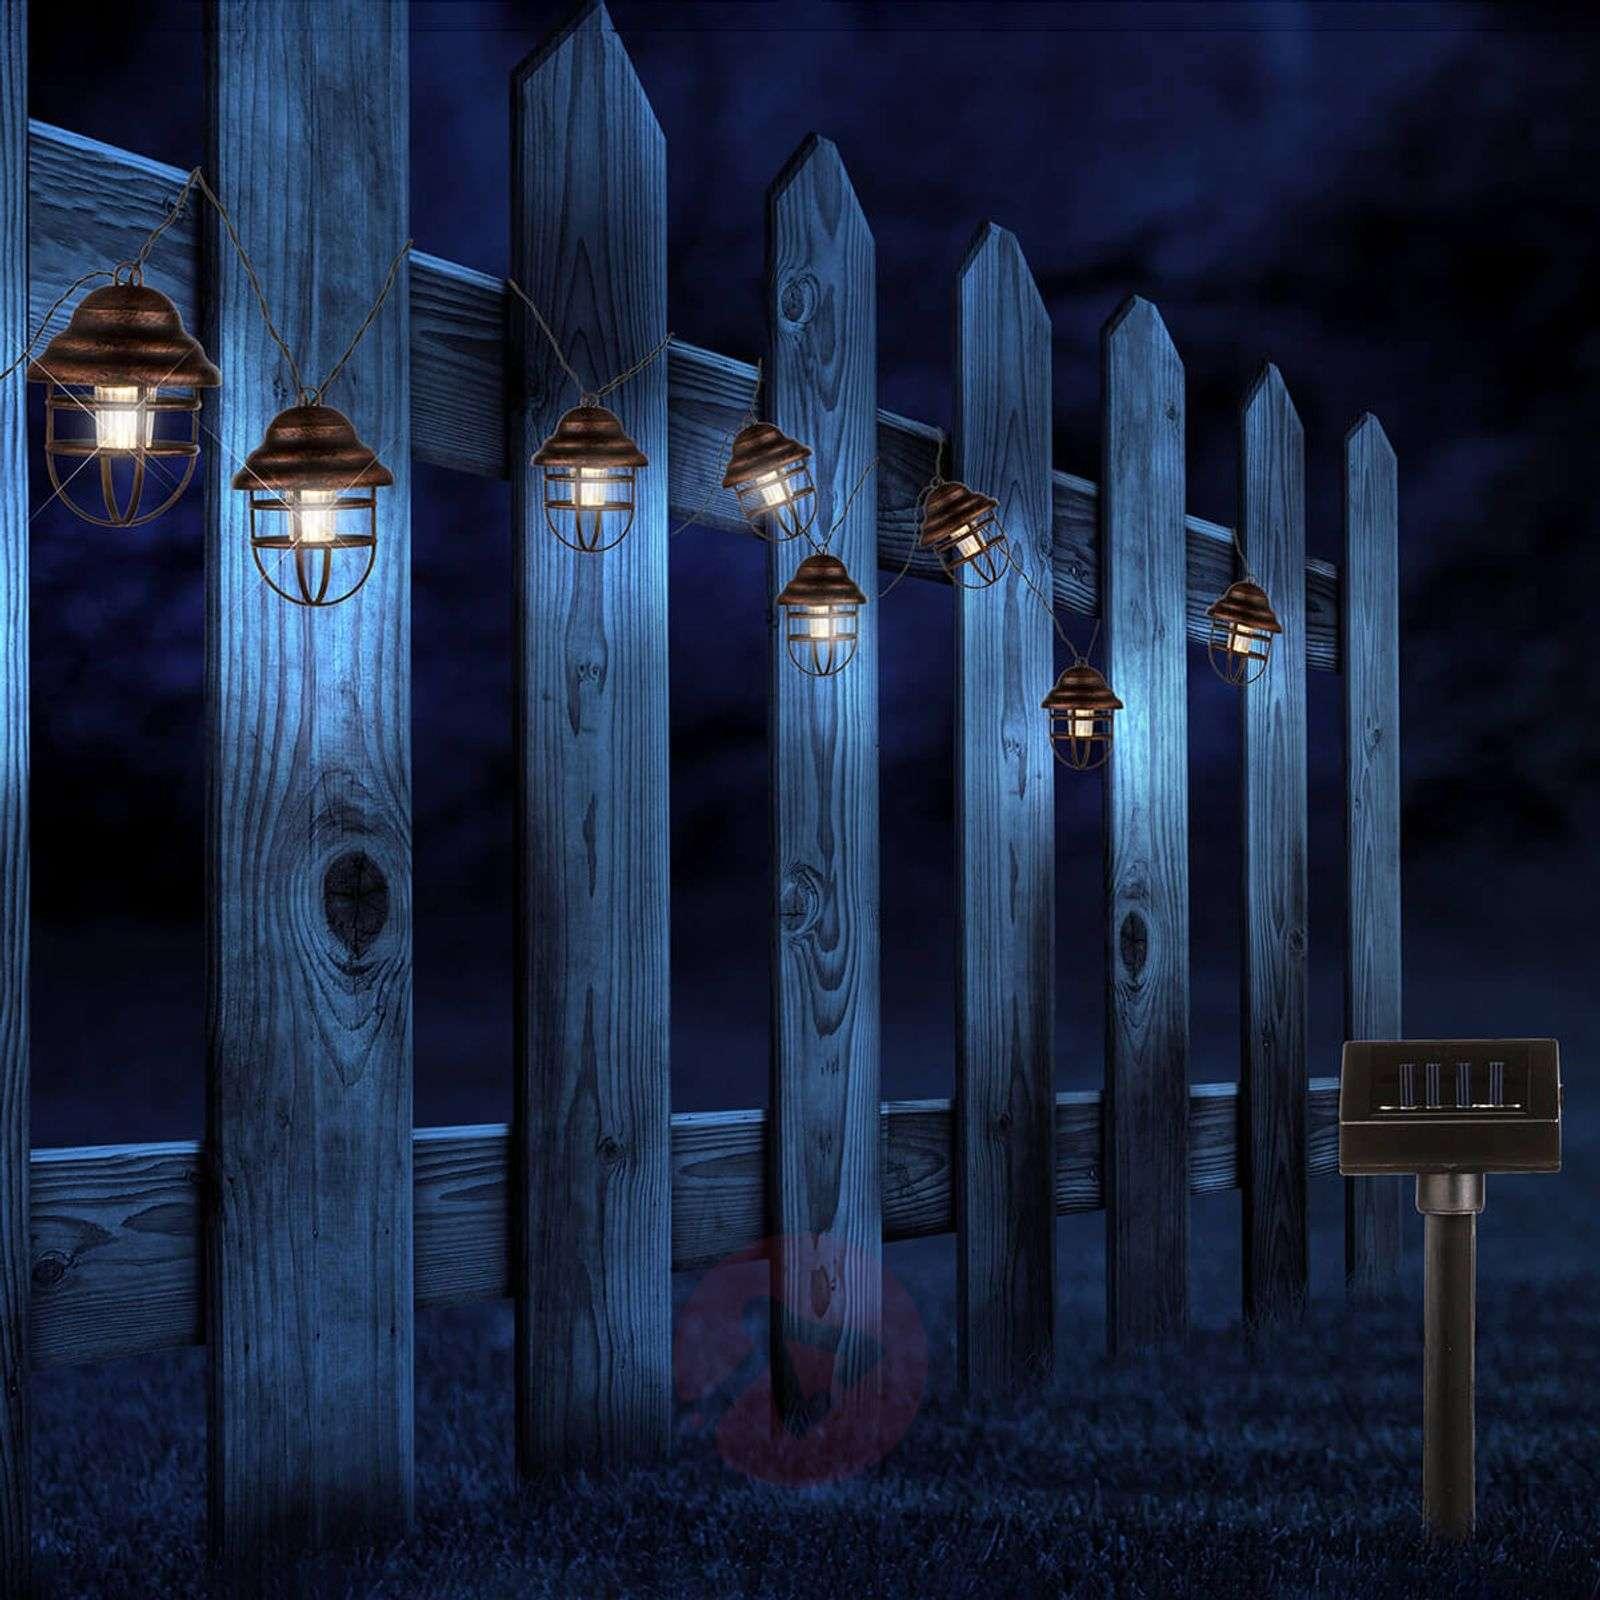 Lina solar string lights with 8 lanterns-4014938-01